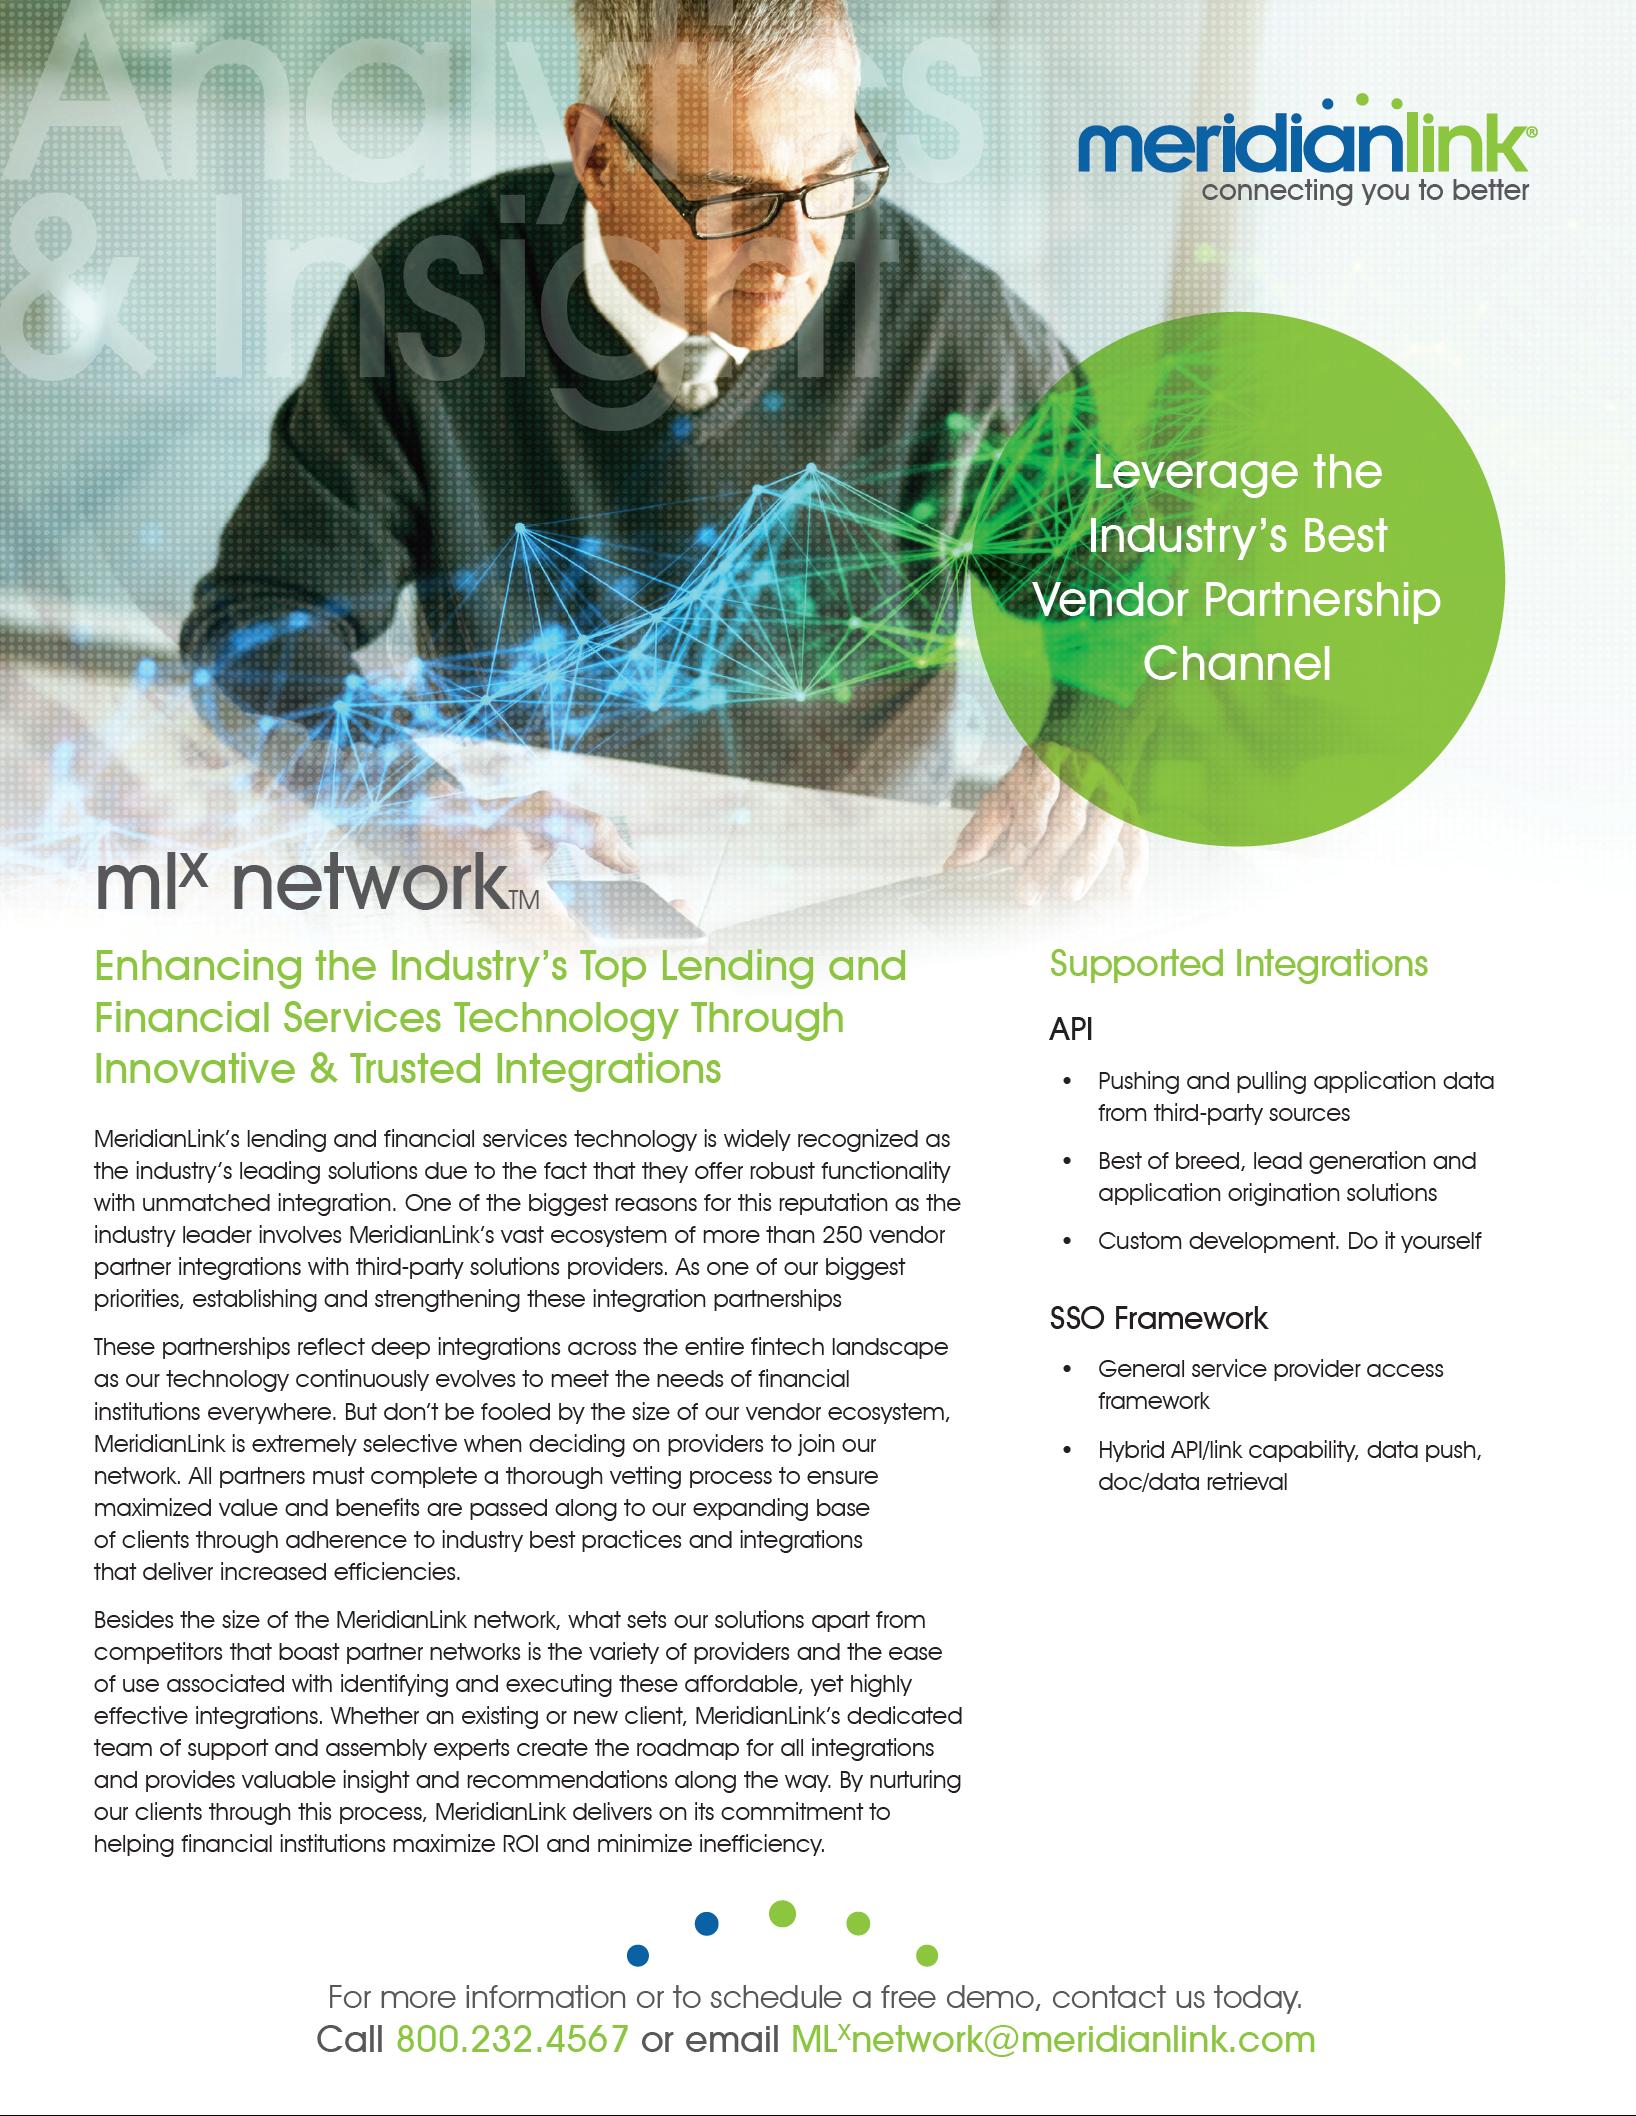 MLX Network